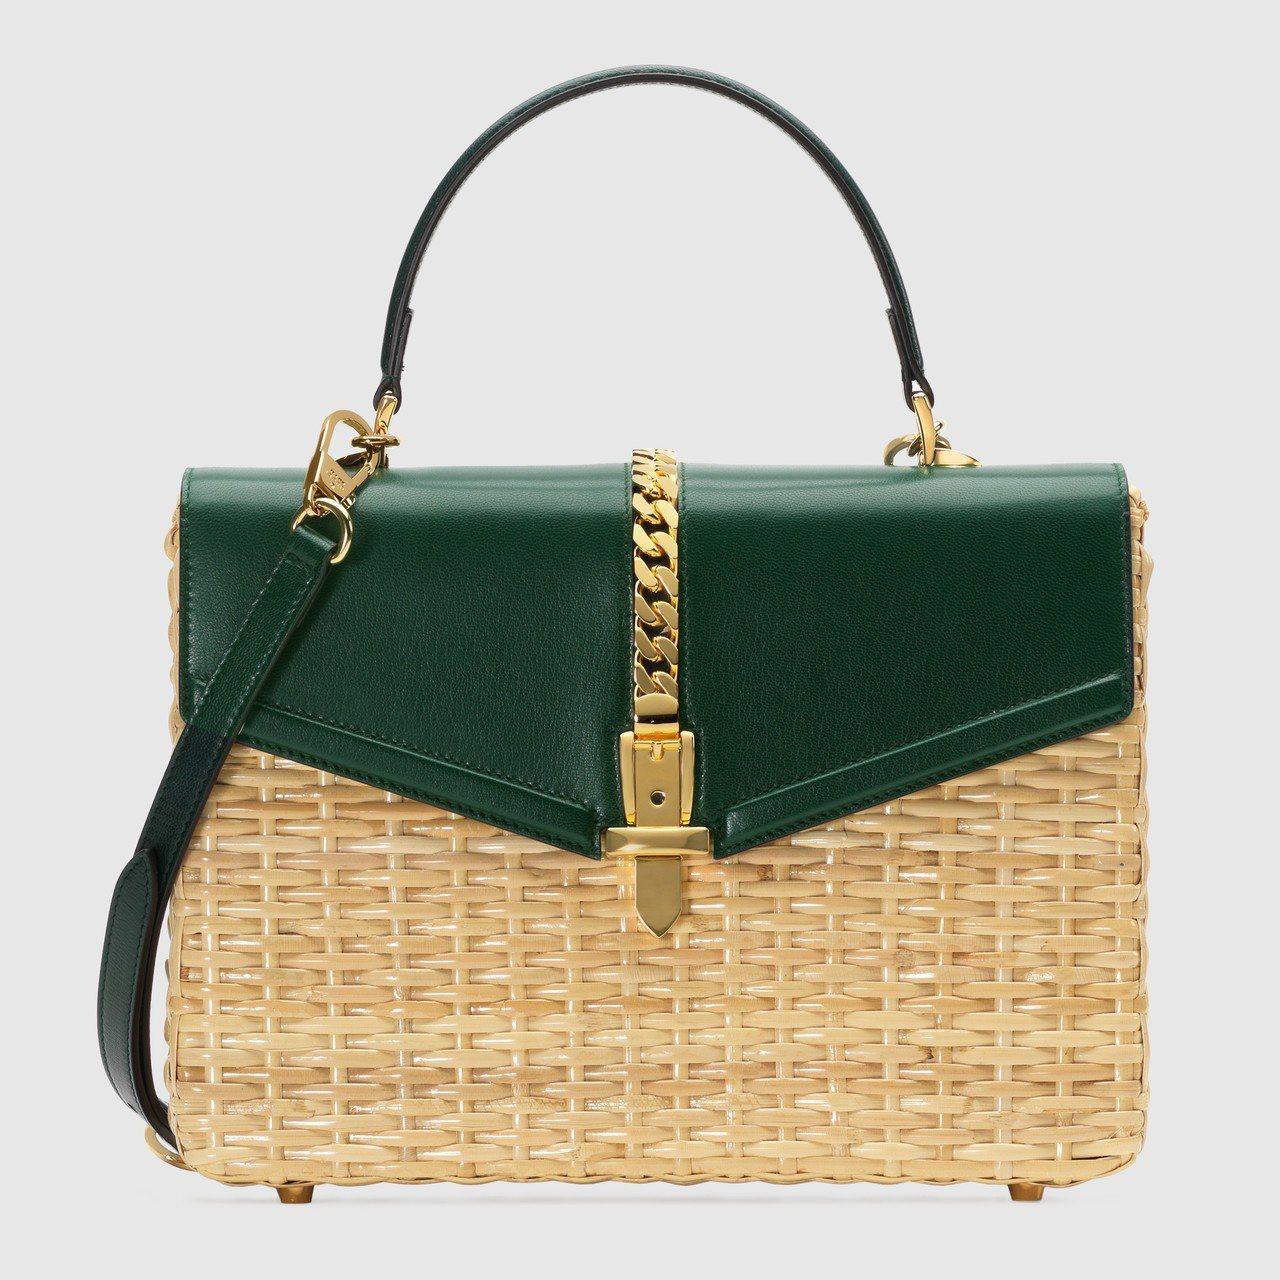 Gucci Sylvie柳條編織墨綠色提包,12萬6,400元。圖/Gucci提...